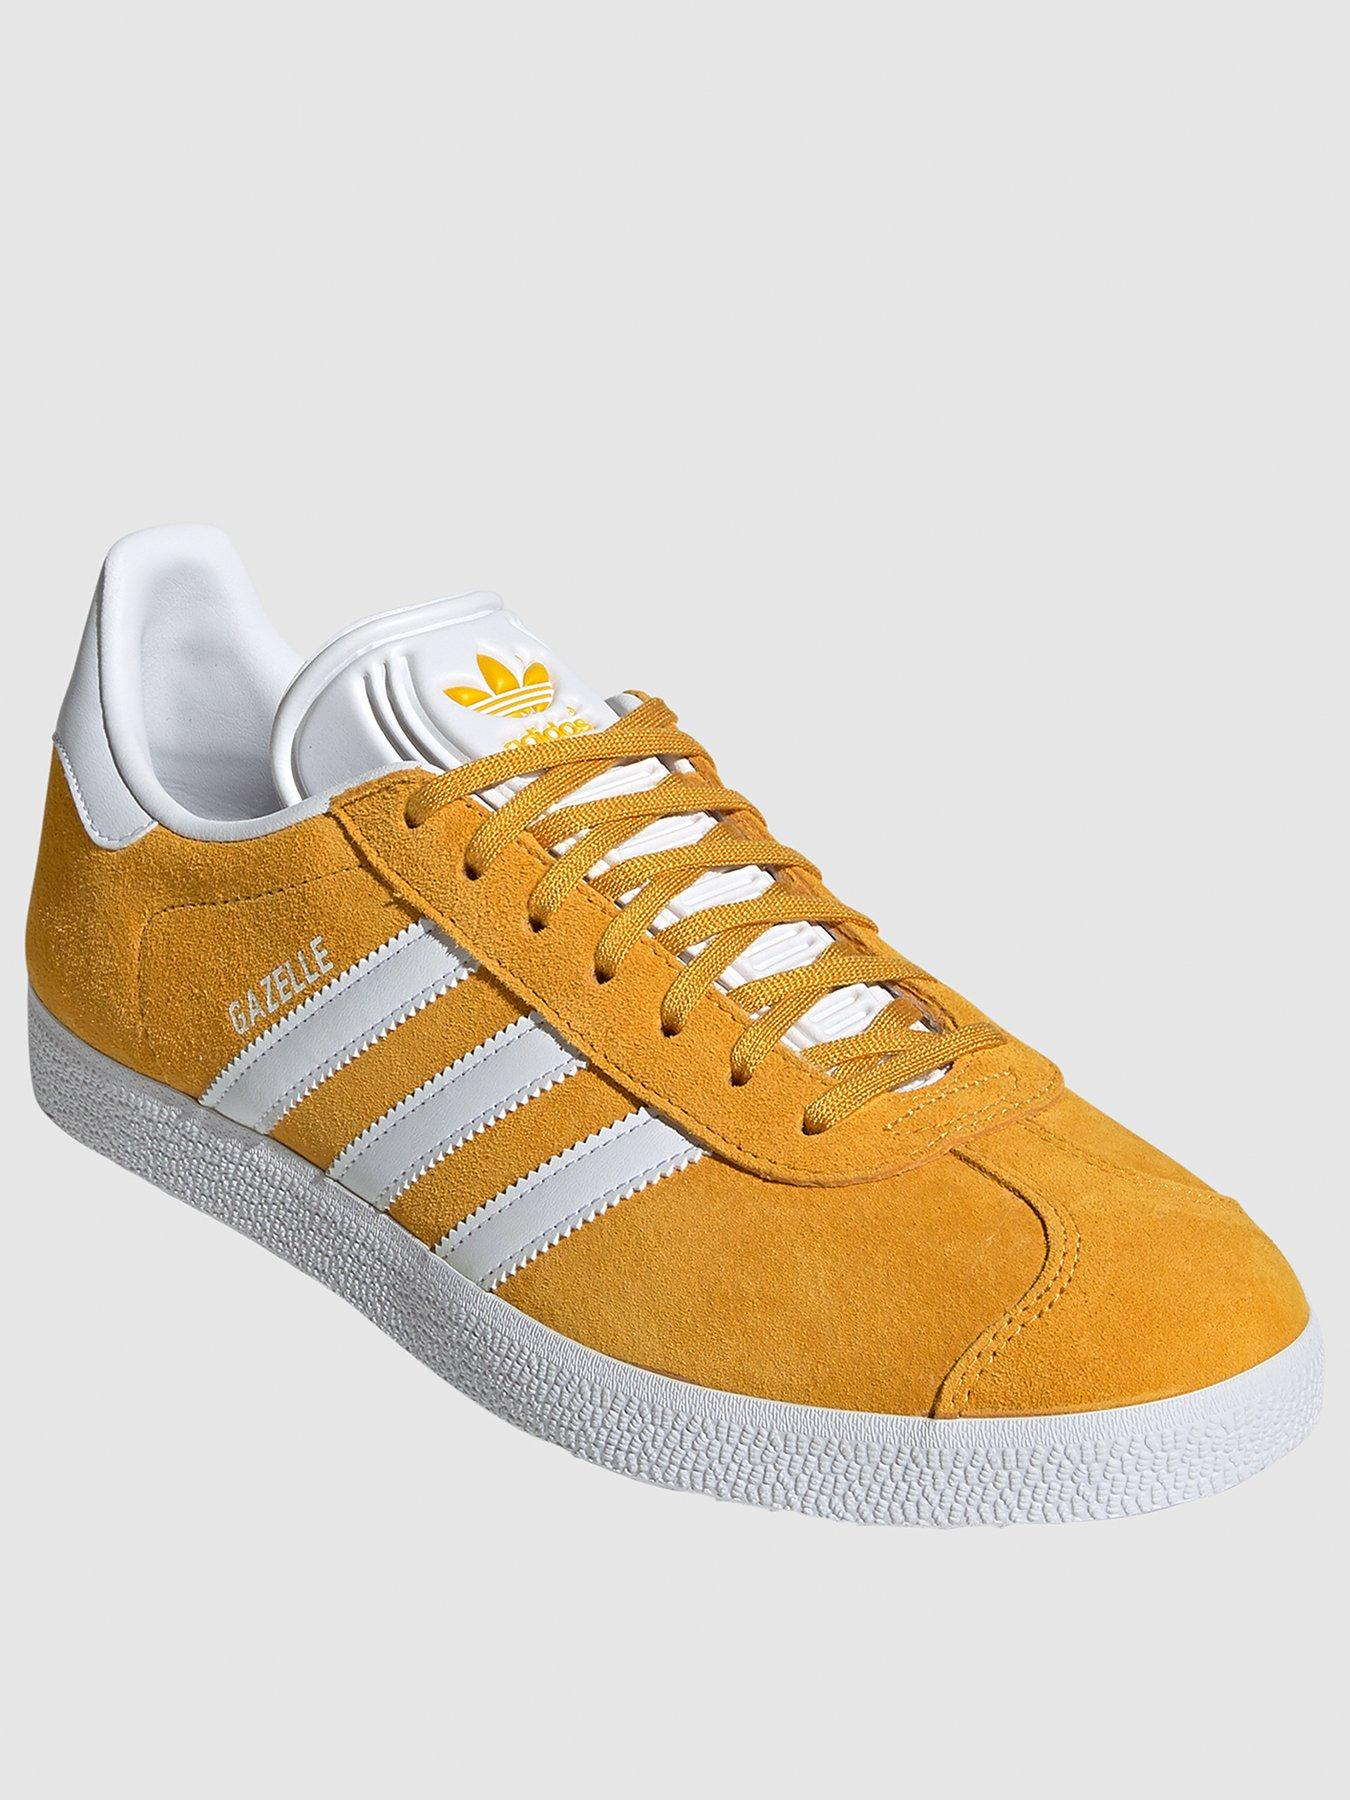 adidas Originals Gazelle - Mustard